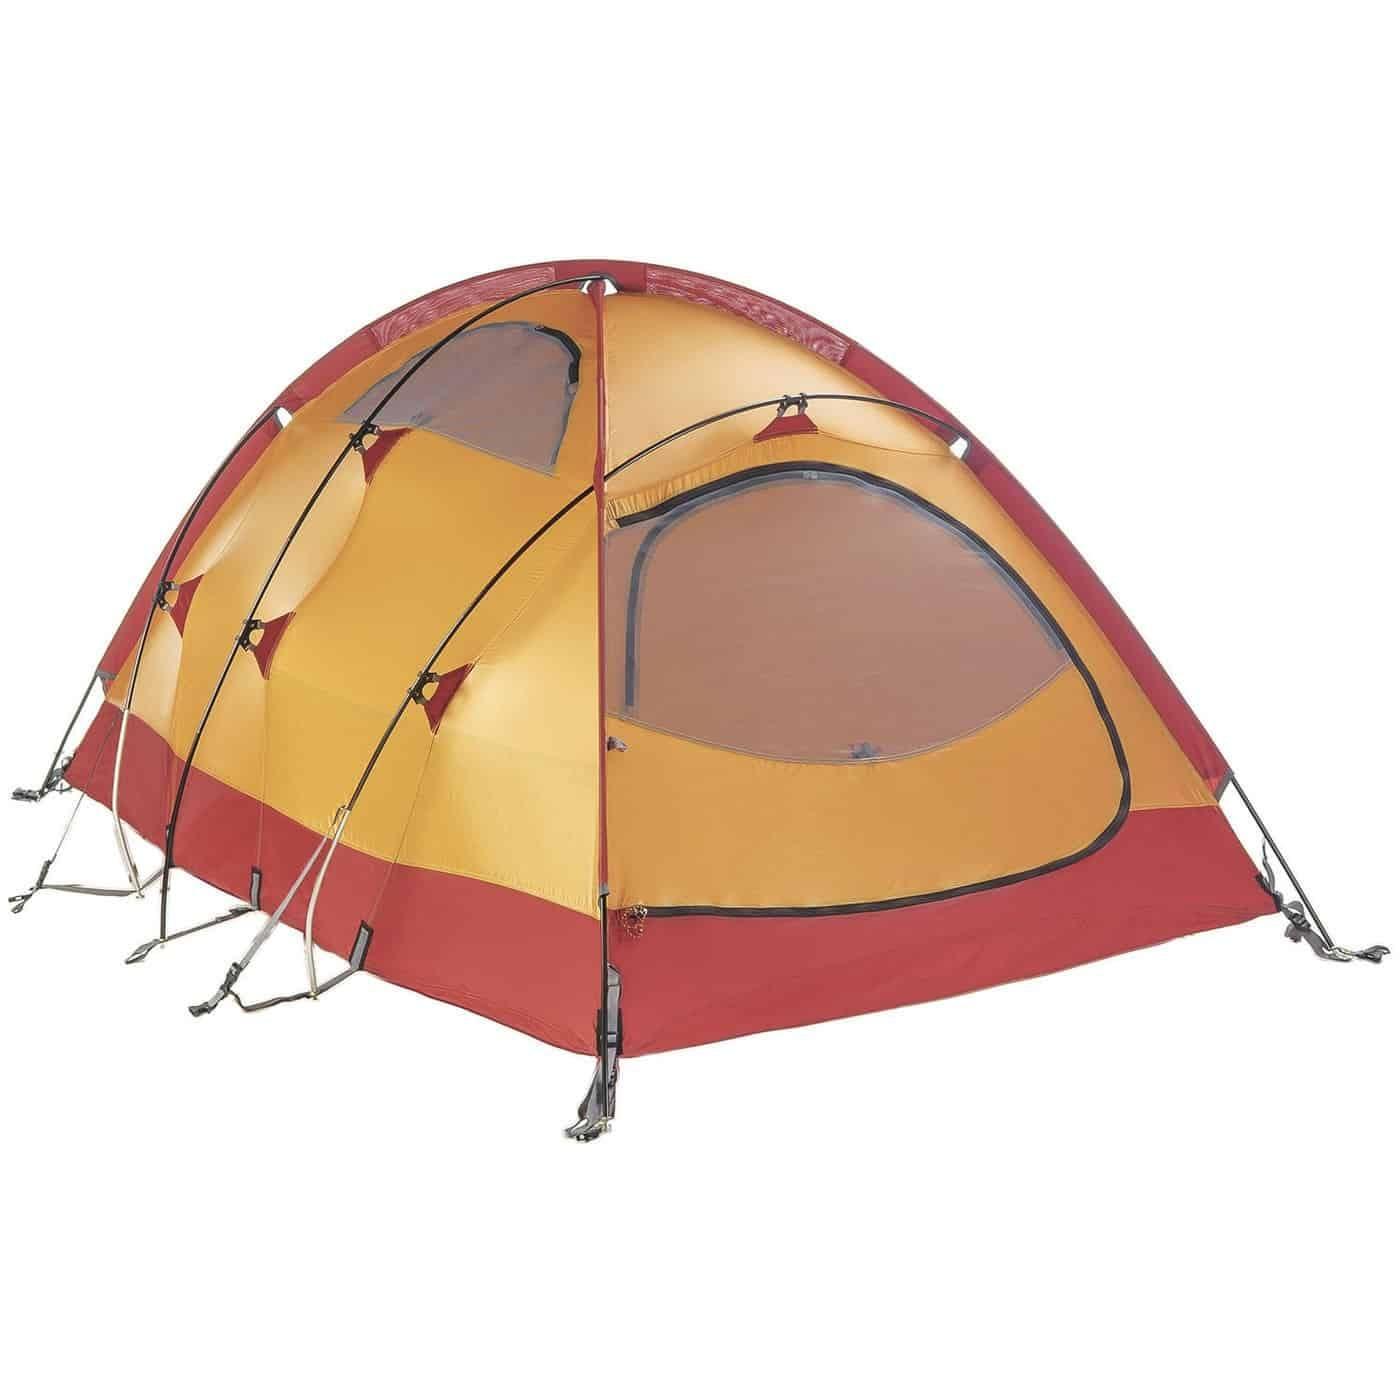 Discover the Thor  sc 1 st  Altitude Blog & Best Marmot 3-Season Tents - Altitude Blog